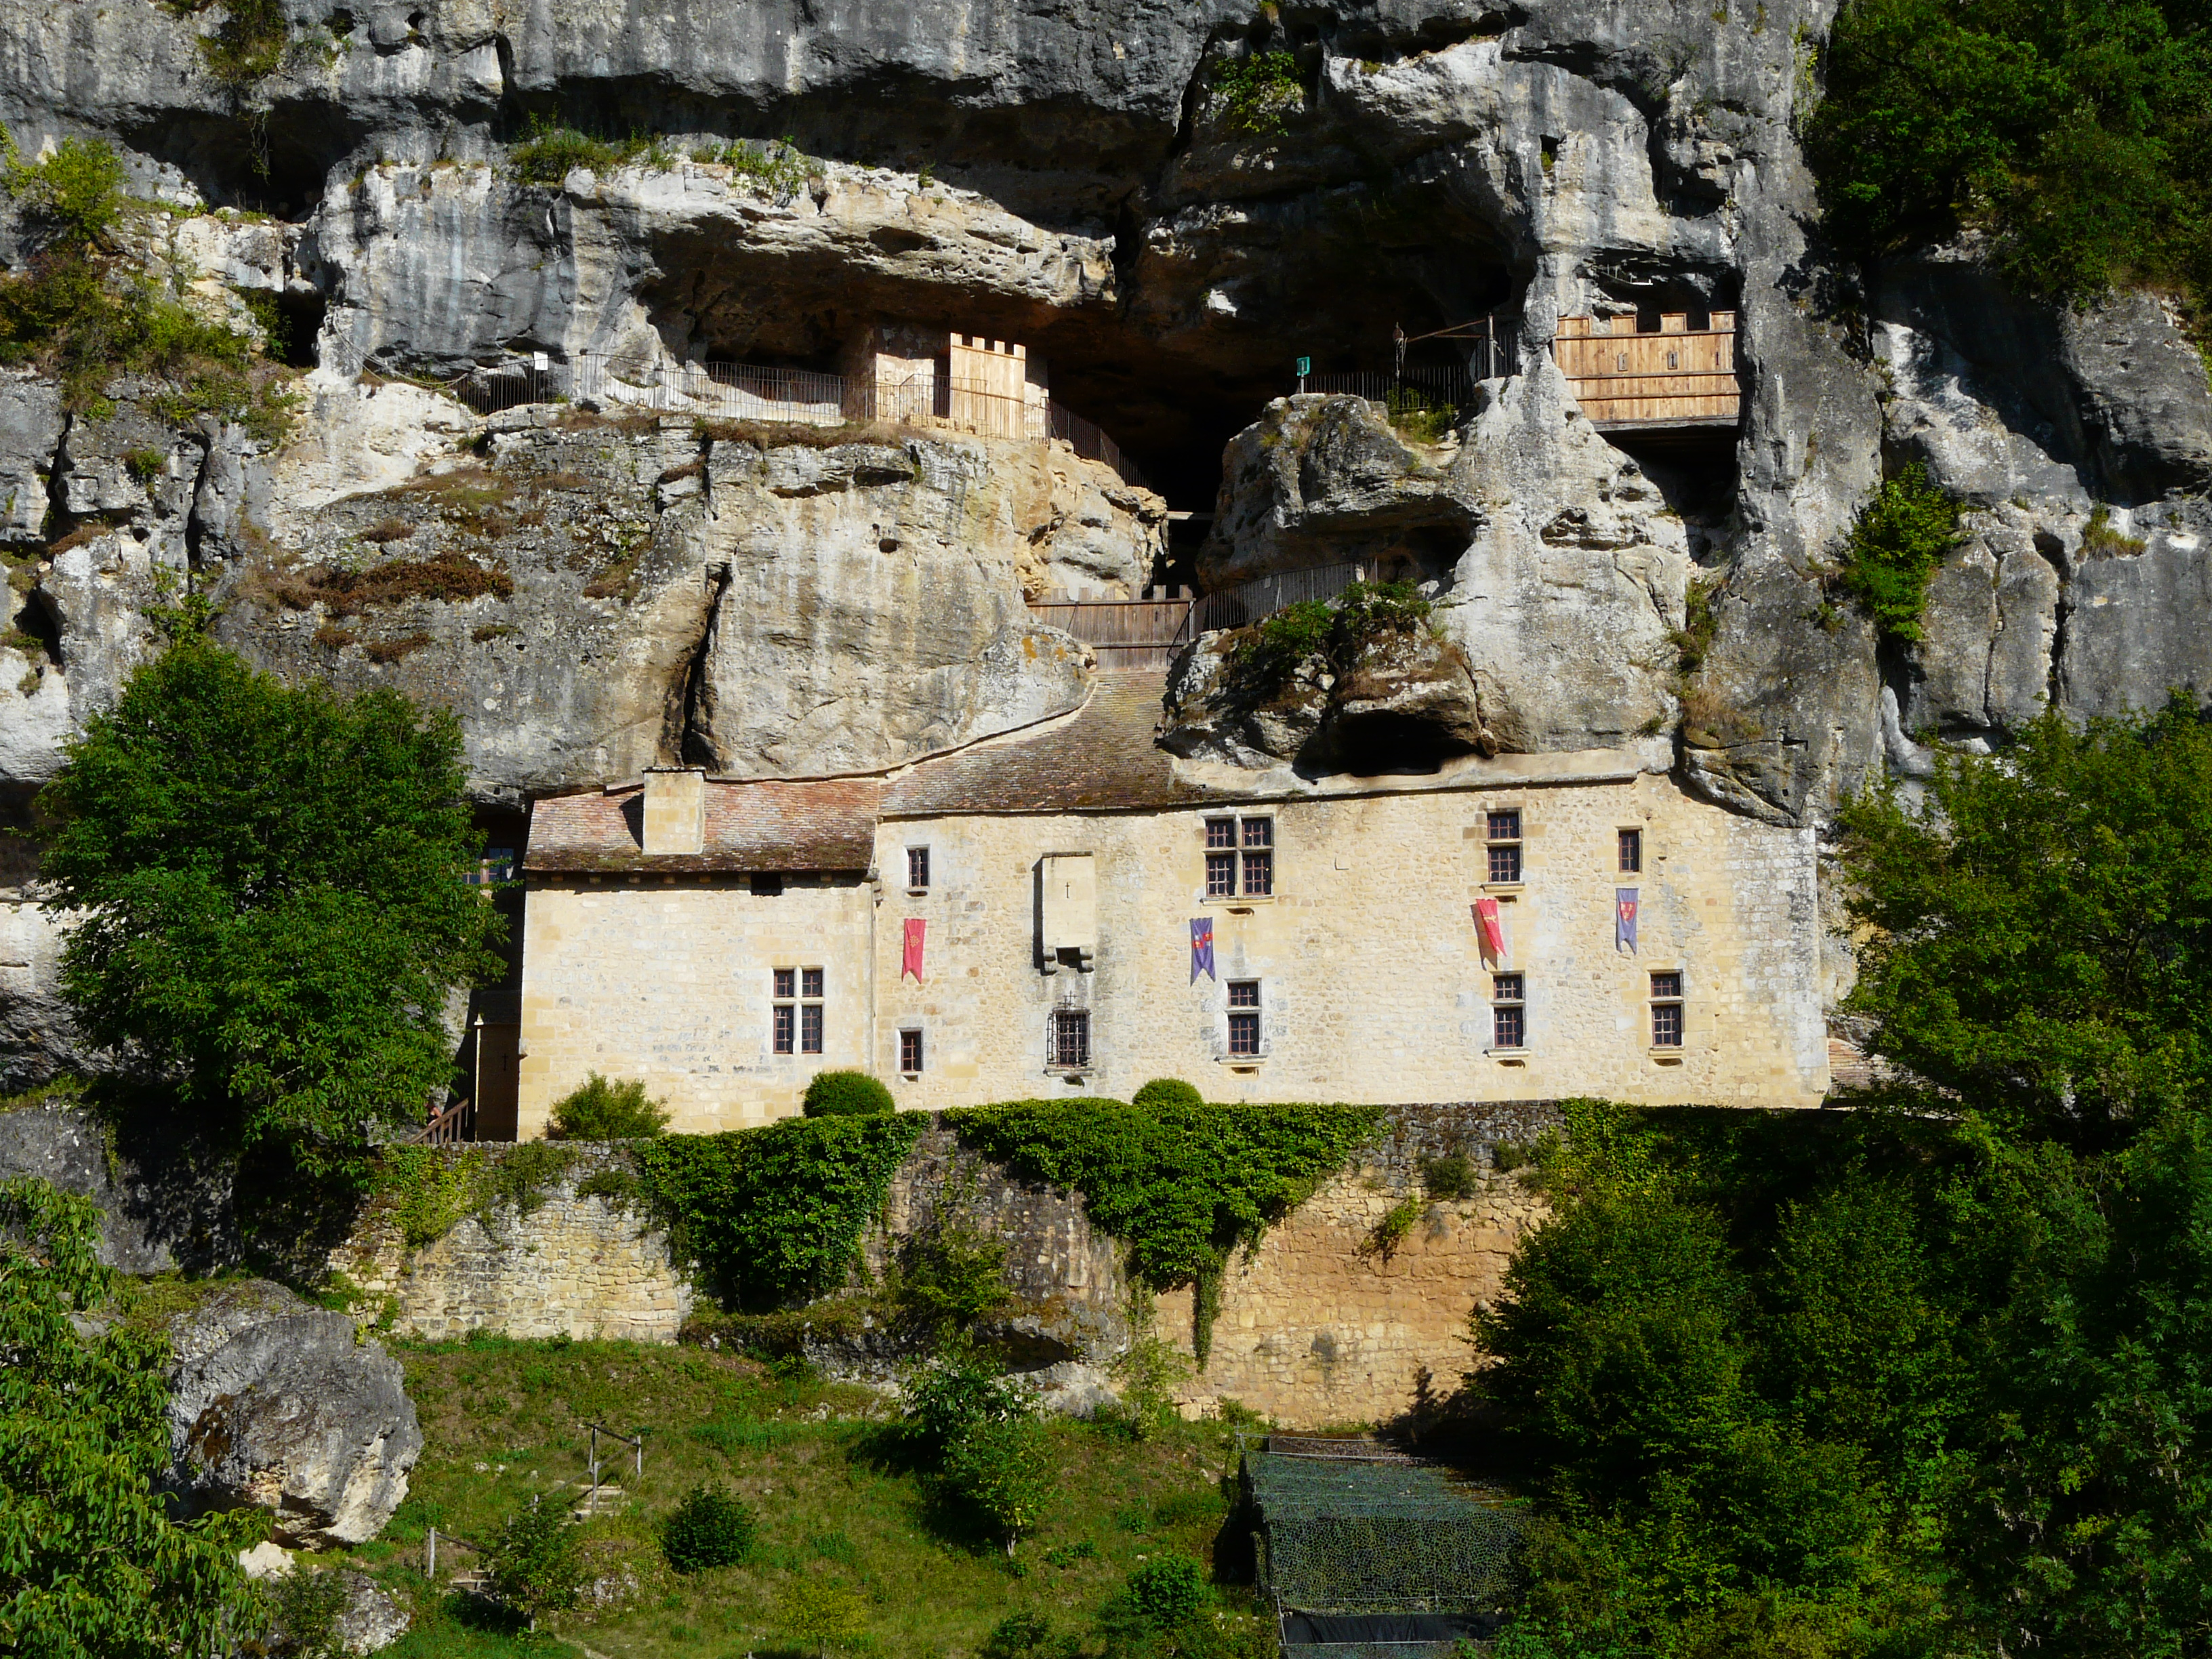 Maison Forte De Reignac Wikipedia